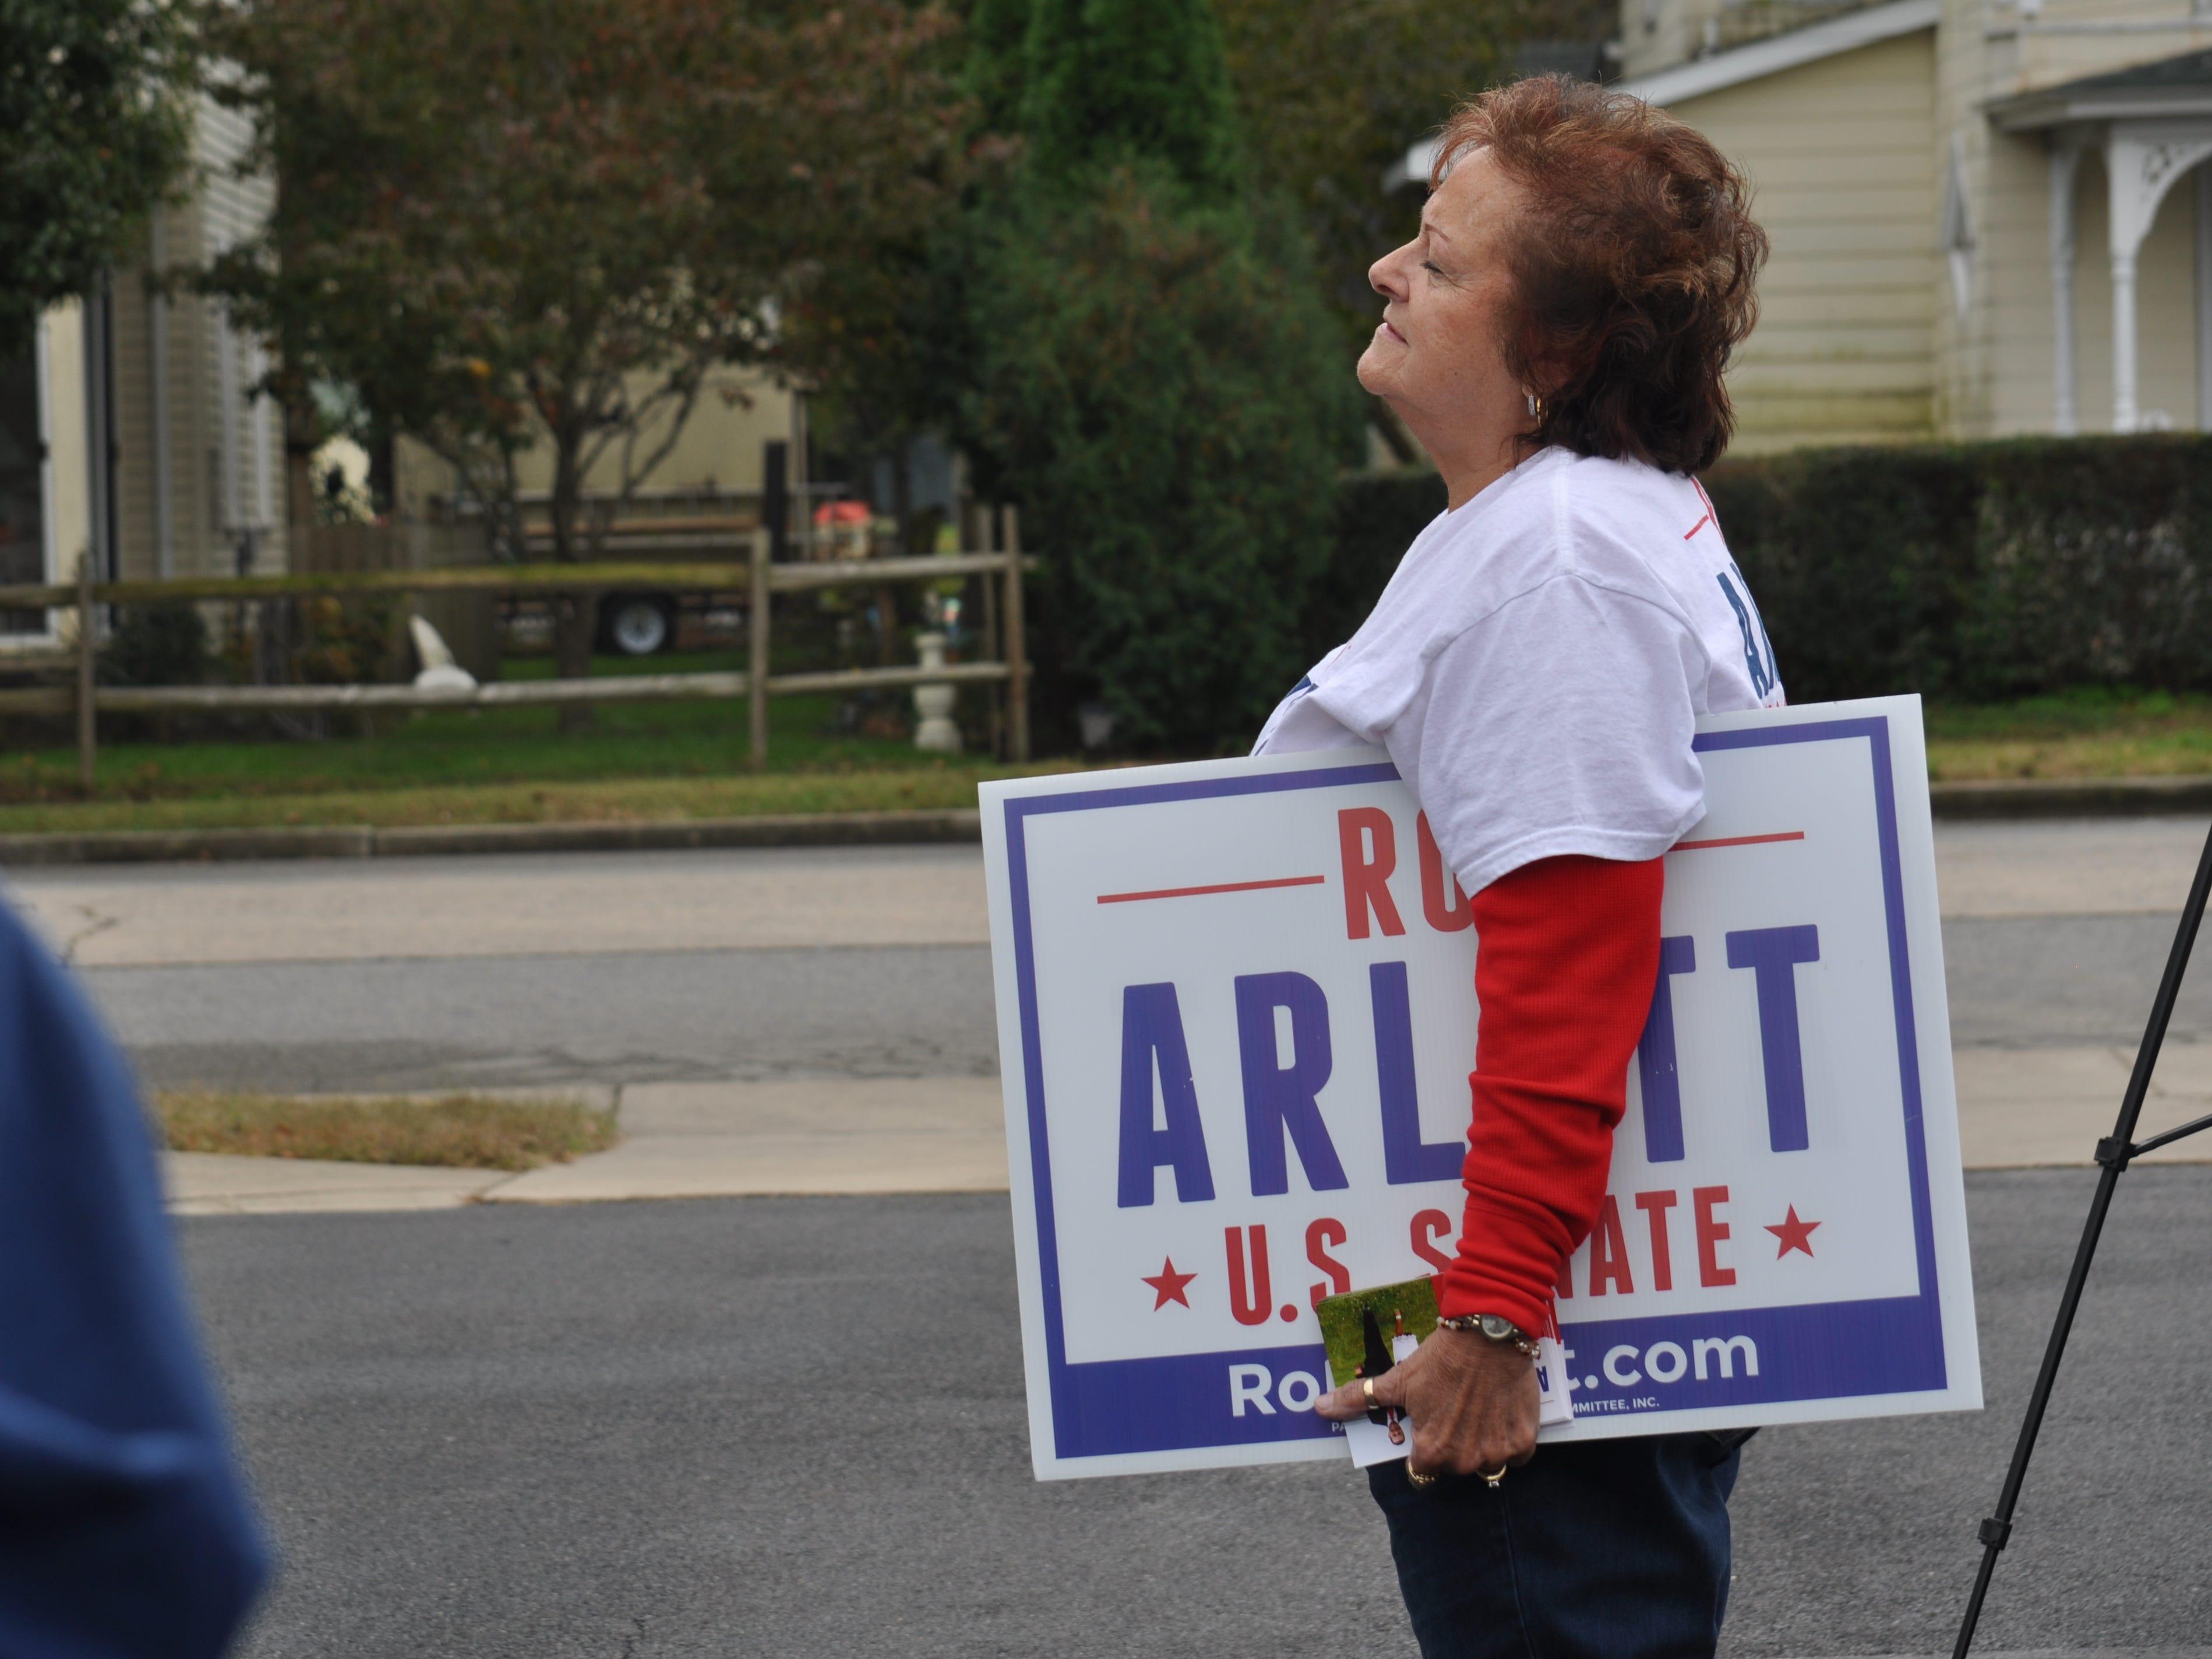 A supporter listens to U.S. Senate candidate Rob Arlett during his Bridgeville stump speech on Oct. 20.